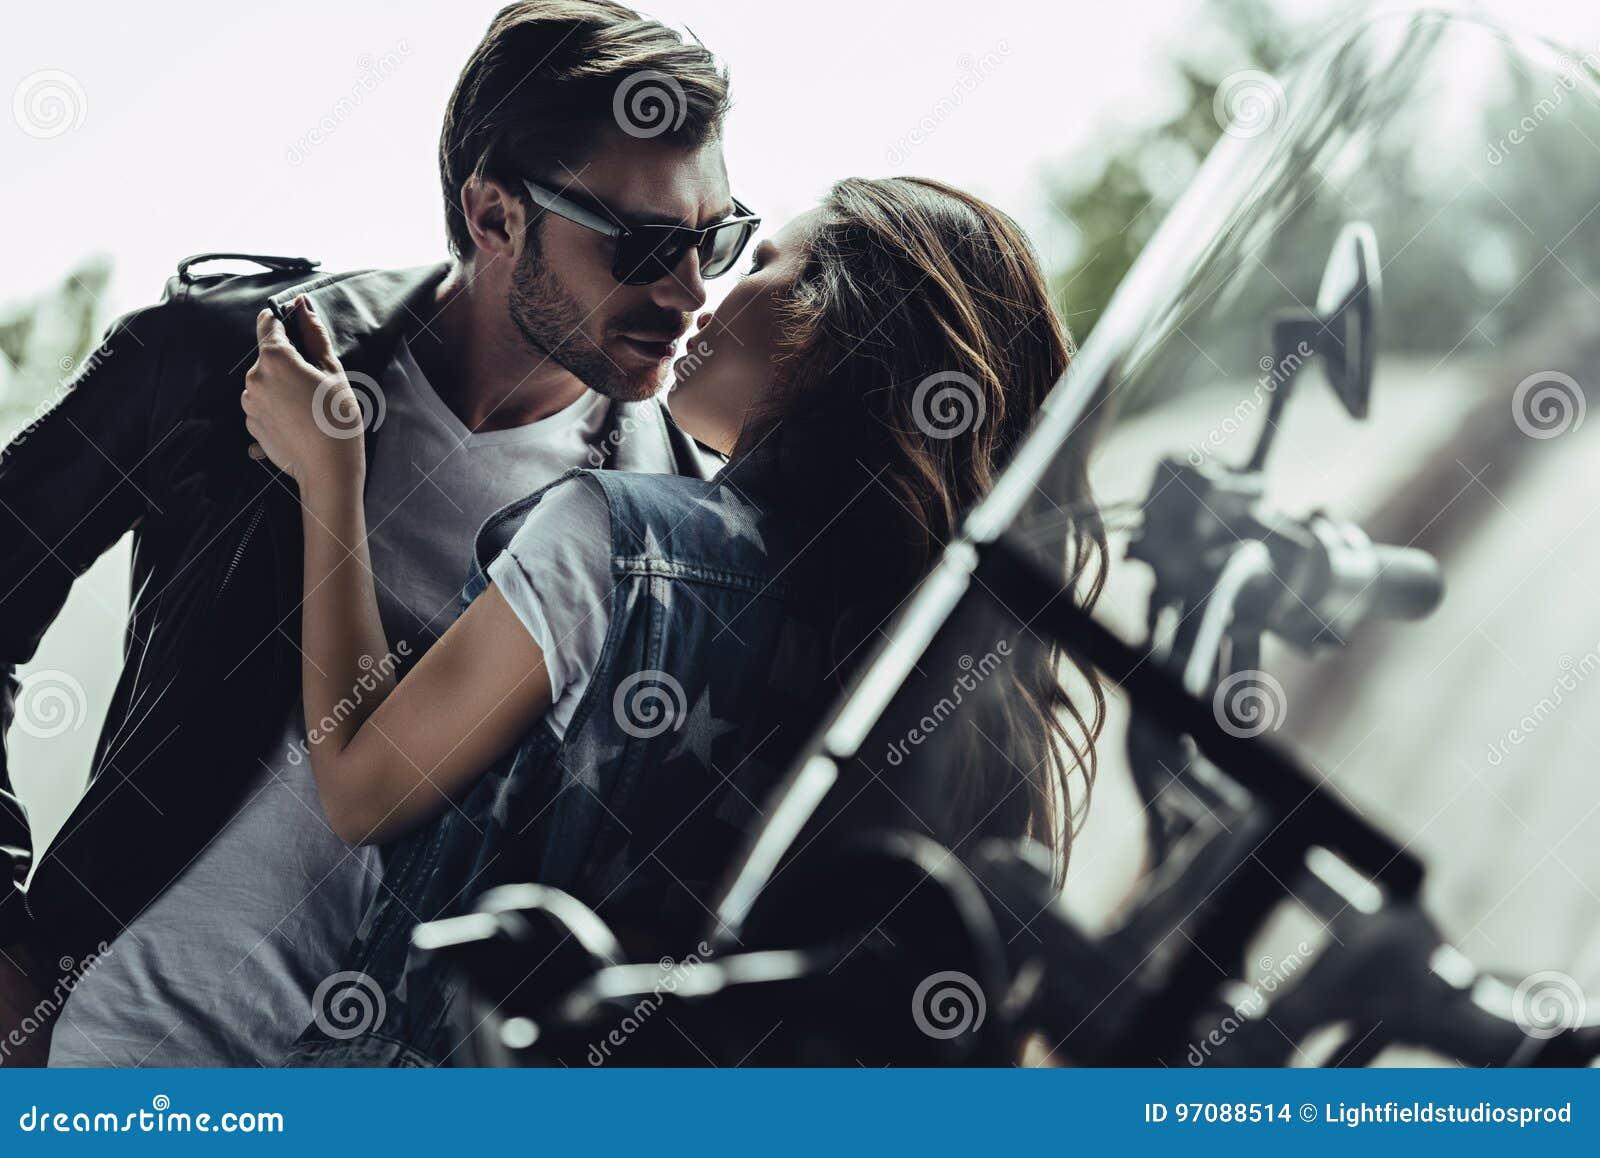 Romantic Bike Couple Wallpaper Automotive Wallpapers